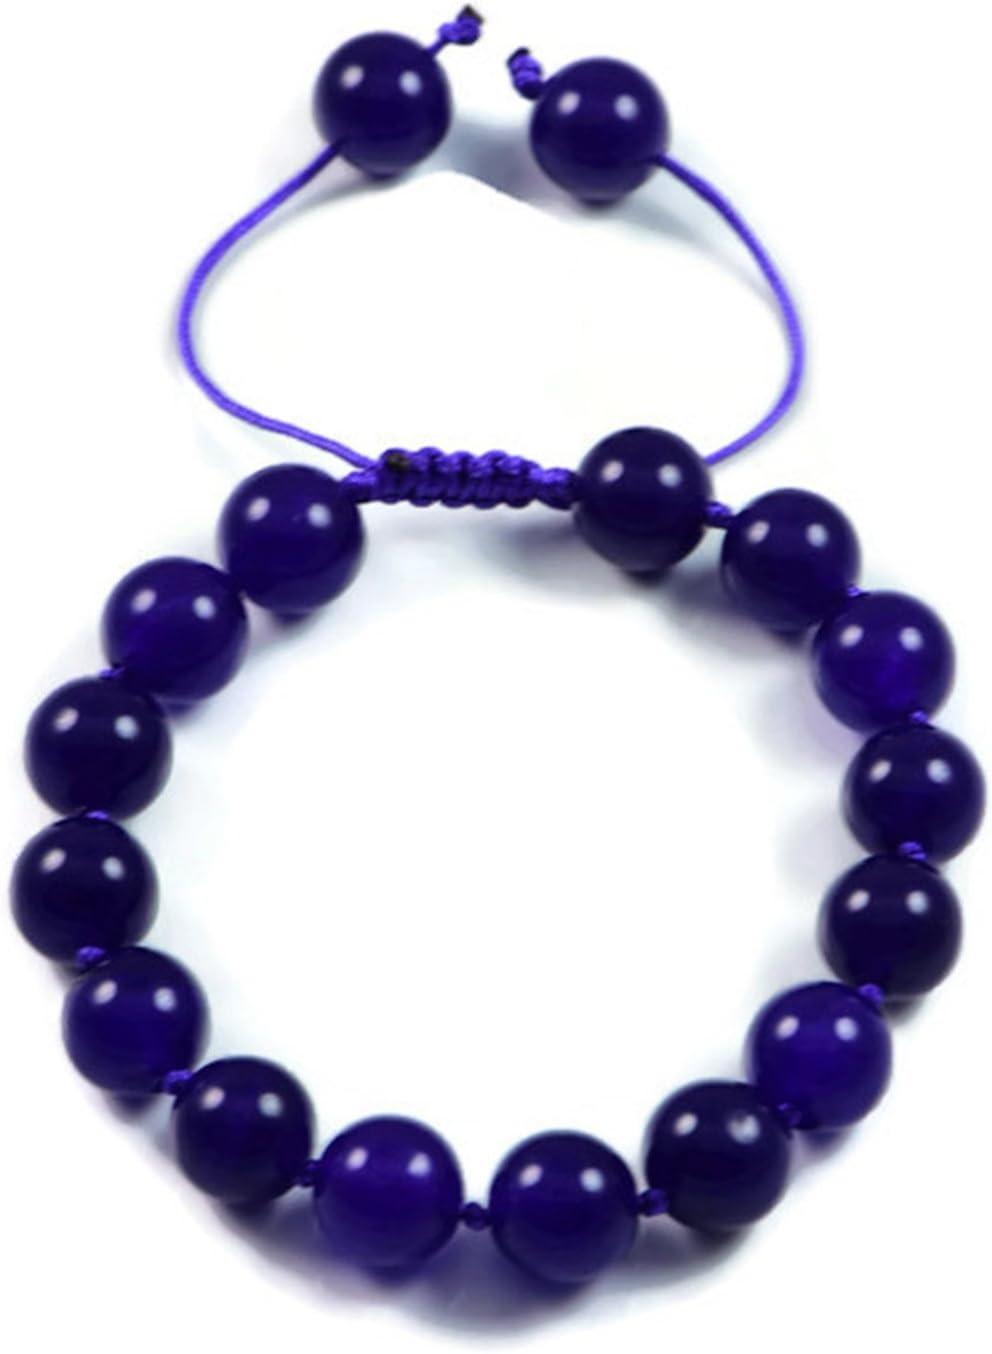 AqBeadsUk Classic Semi-Precious 10mm Redondo Piedras preciosas Dark Amatista Beads 7.8 pulgadas Cerrado 11.2 pulgadas Abierto Lujo Hand-anudado Pulsera de las mujeres